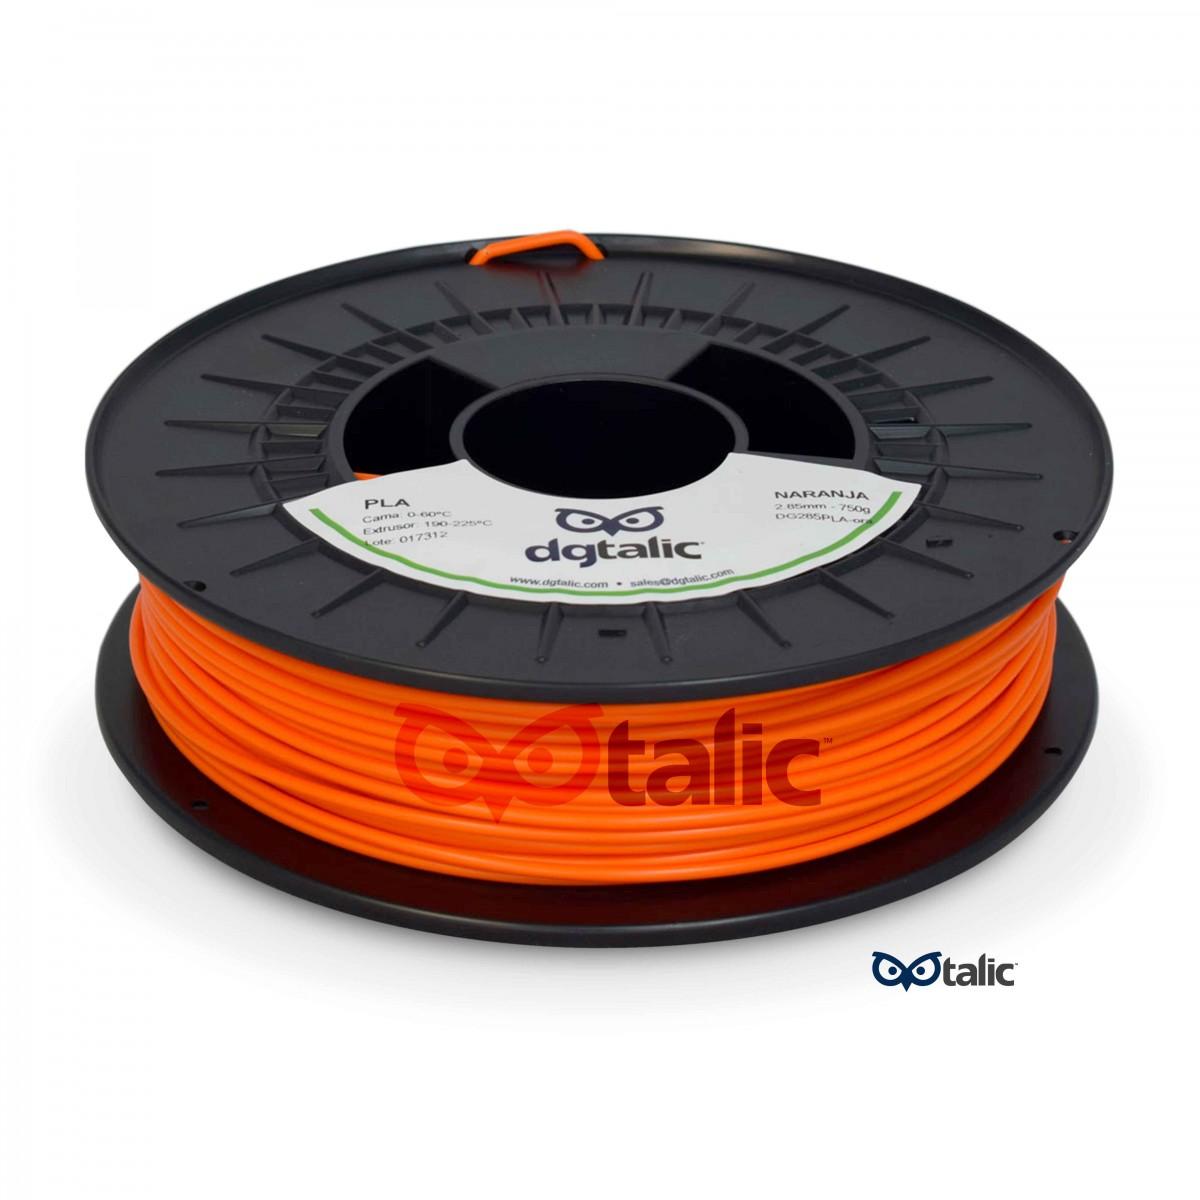 naranja 2 85 - PLA - Filamento DGtalic 750gr. - 2.85mm - Naranja